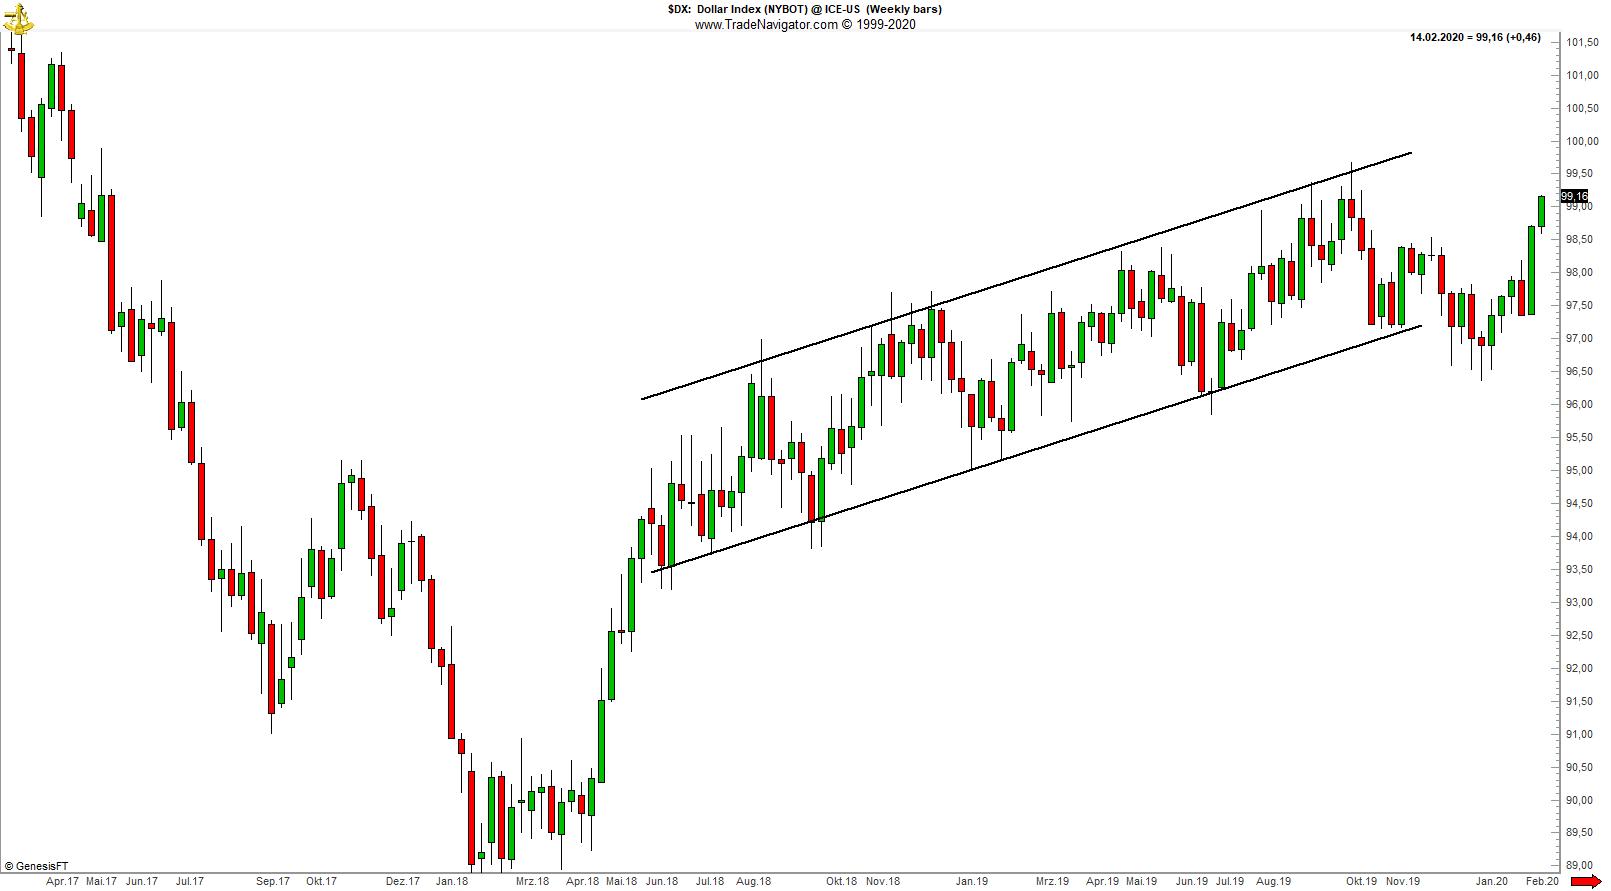 Trendkanal_US_Dollar